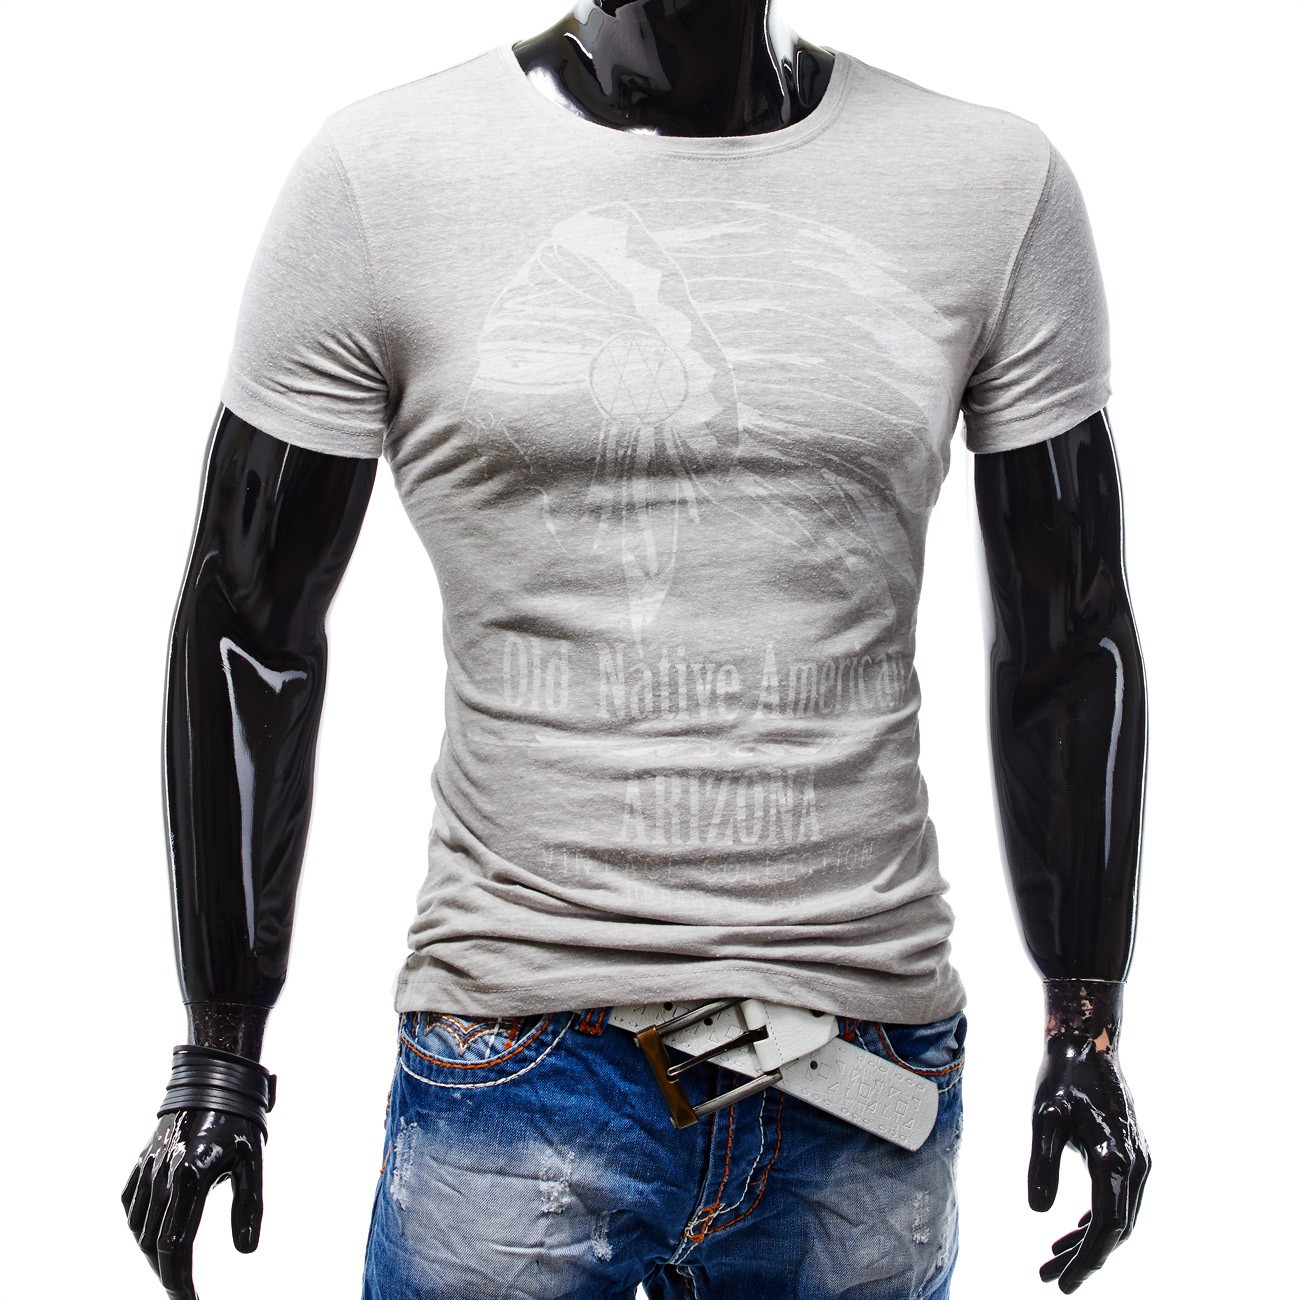 herren kurzarm t shirt polo stretch slim fit clubwear shirt arizona. Black Bedroom Furniture Sets. Home Design Ideas